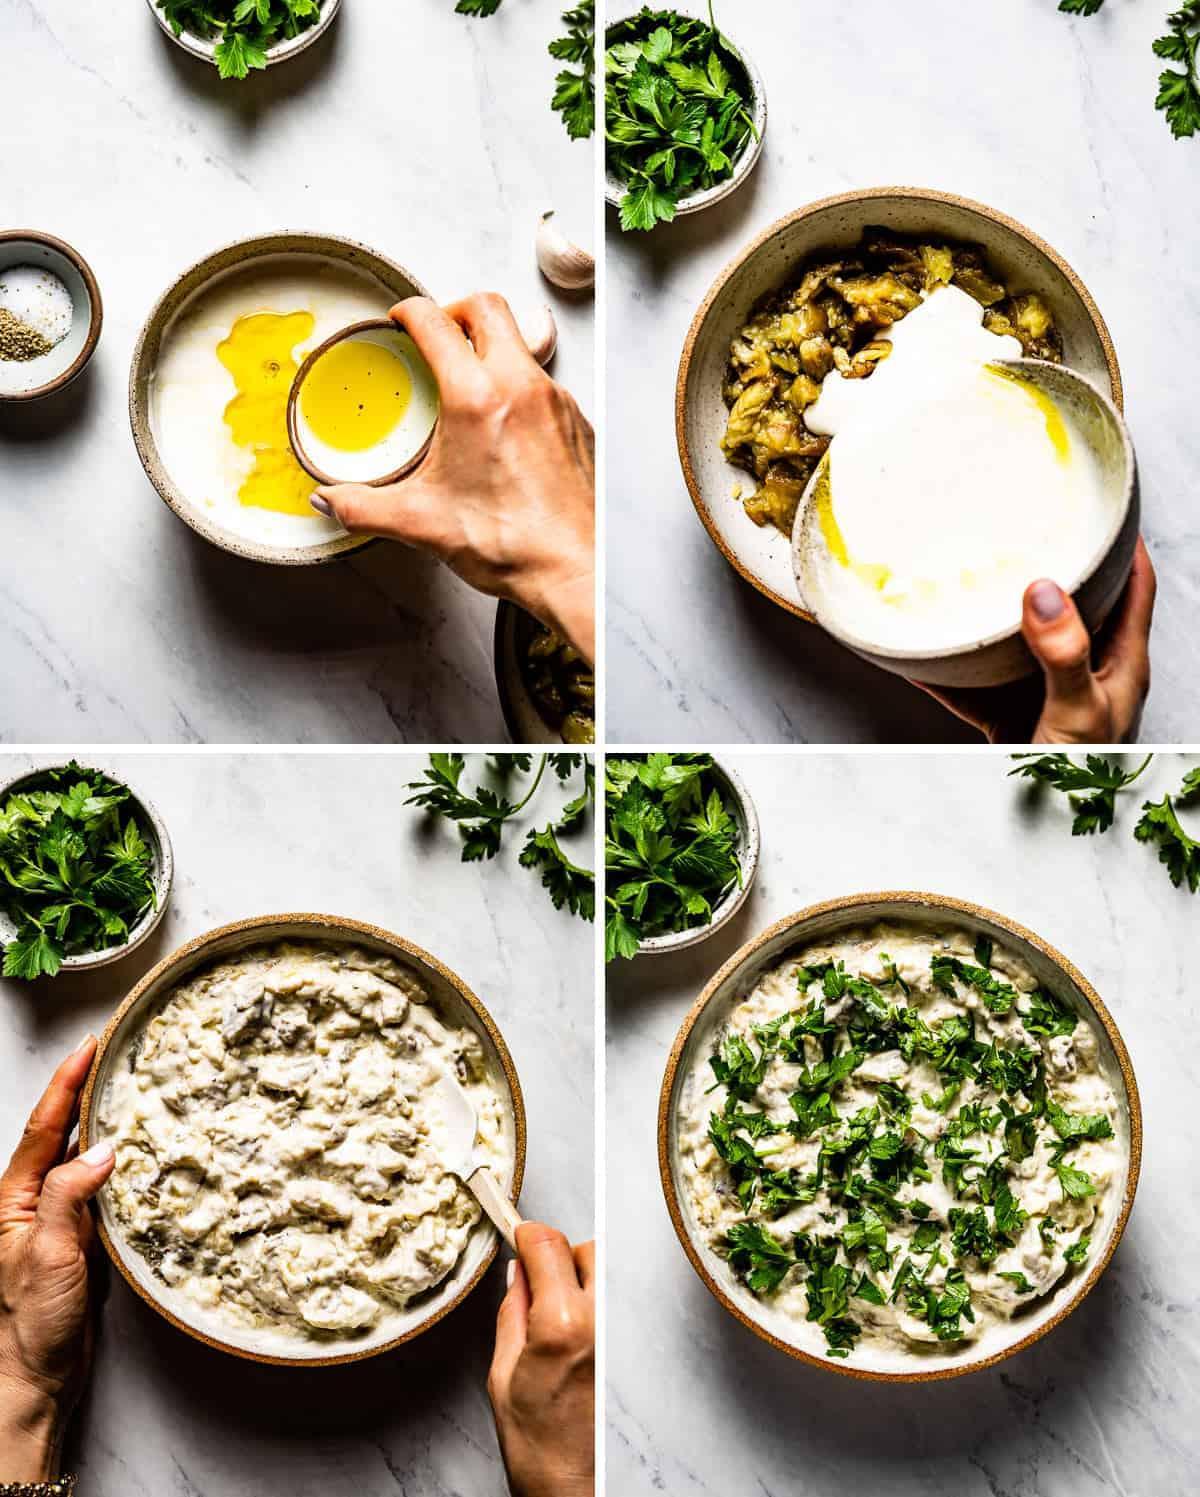 Showing steps of making the yogurt eggplant dip greek style